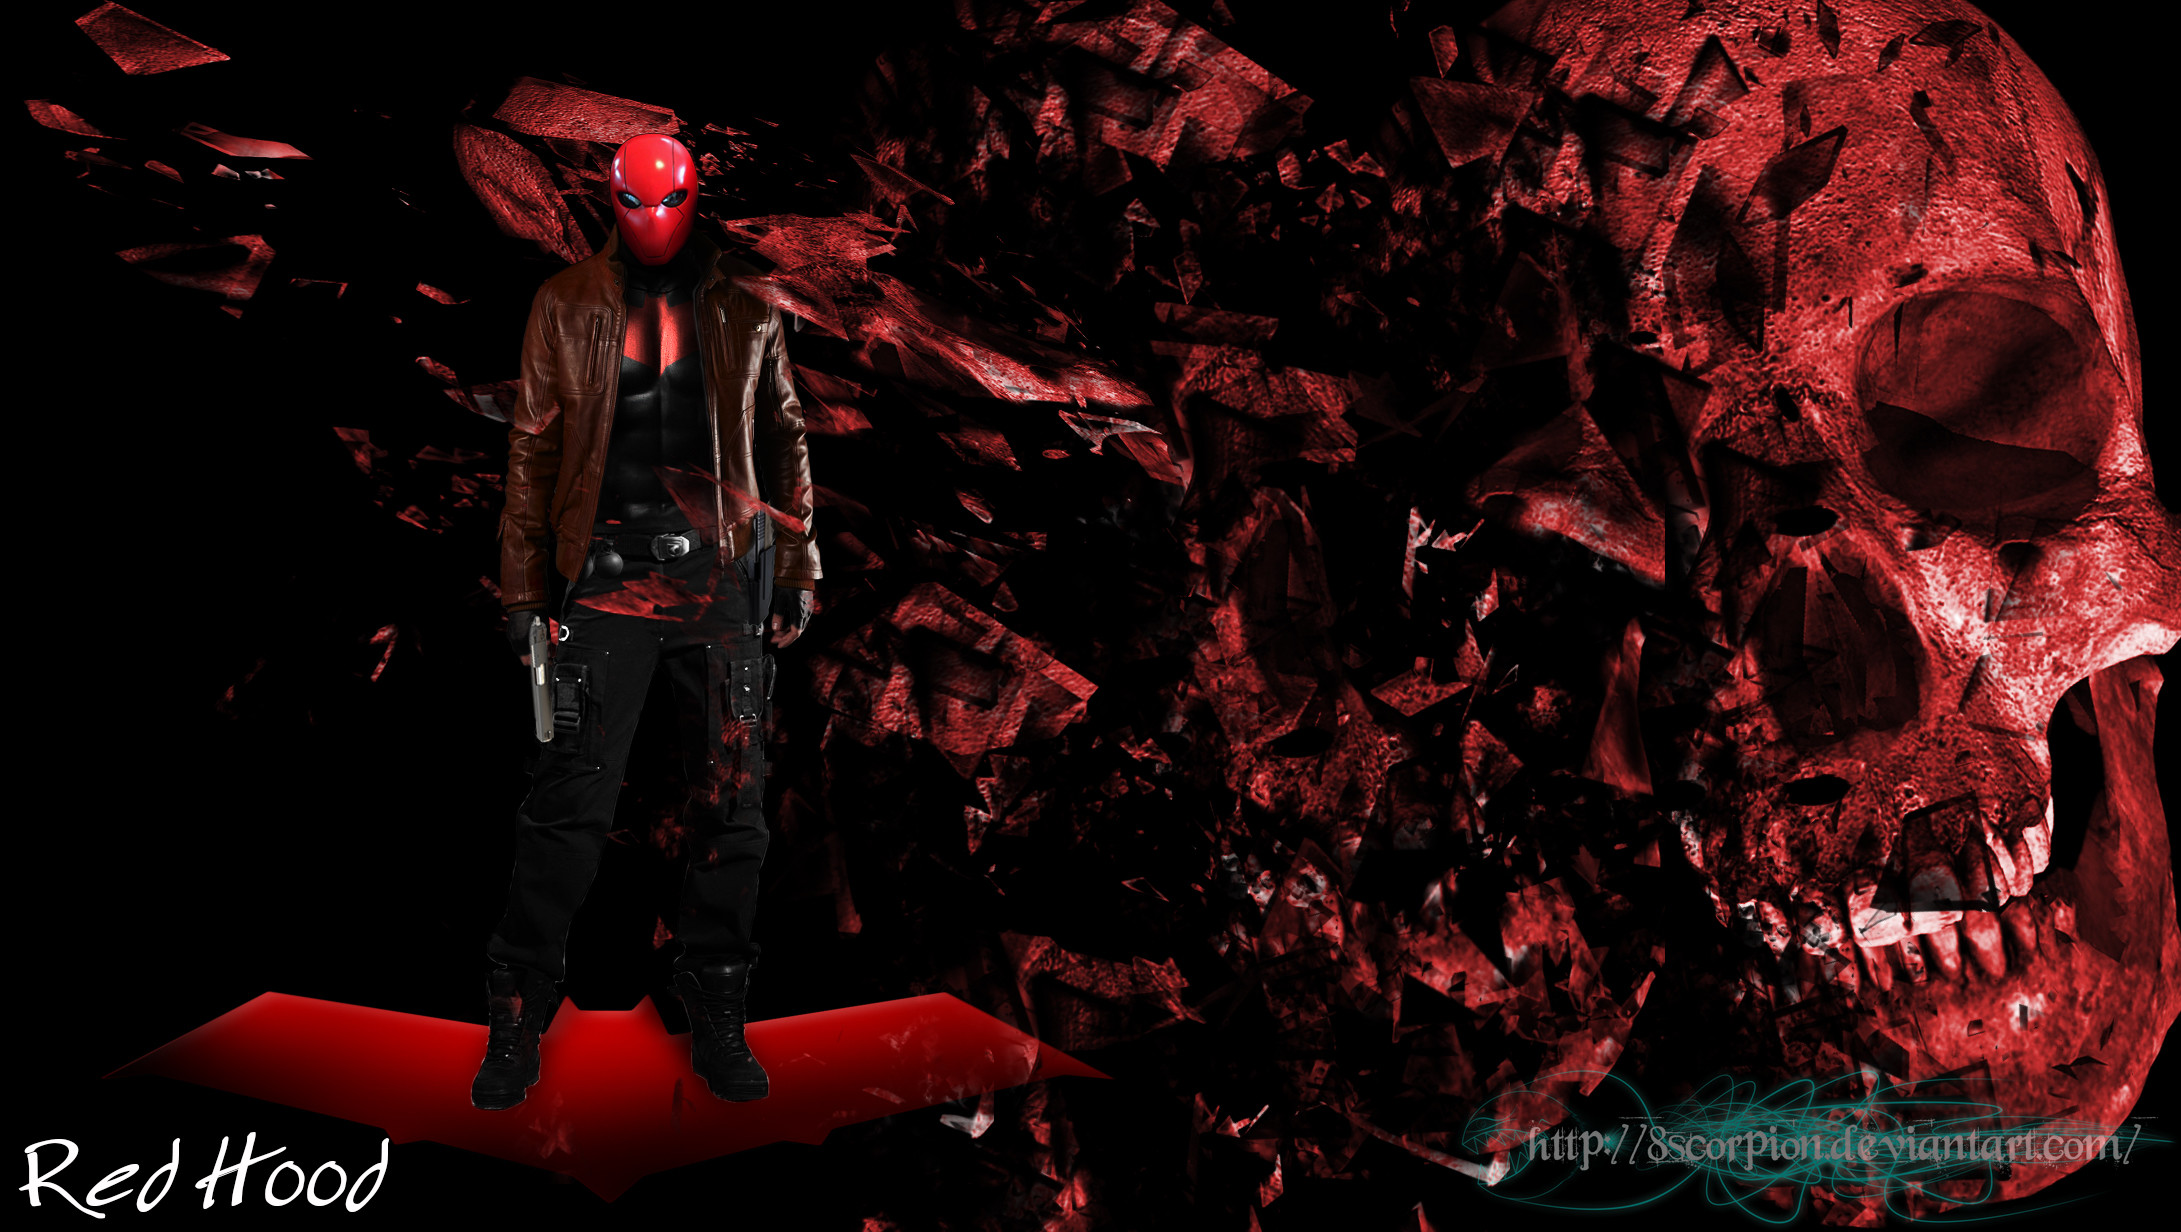 Red Hood Batman wallpaper by 8scorpion Red Hood Batman wallpaper by  8scorpion